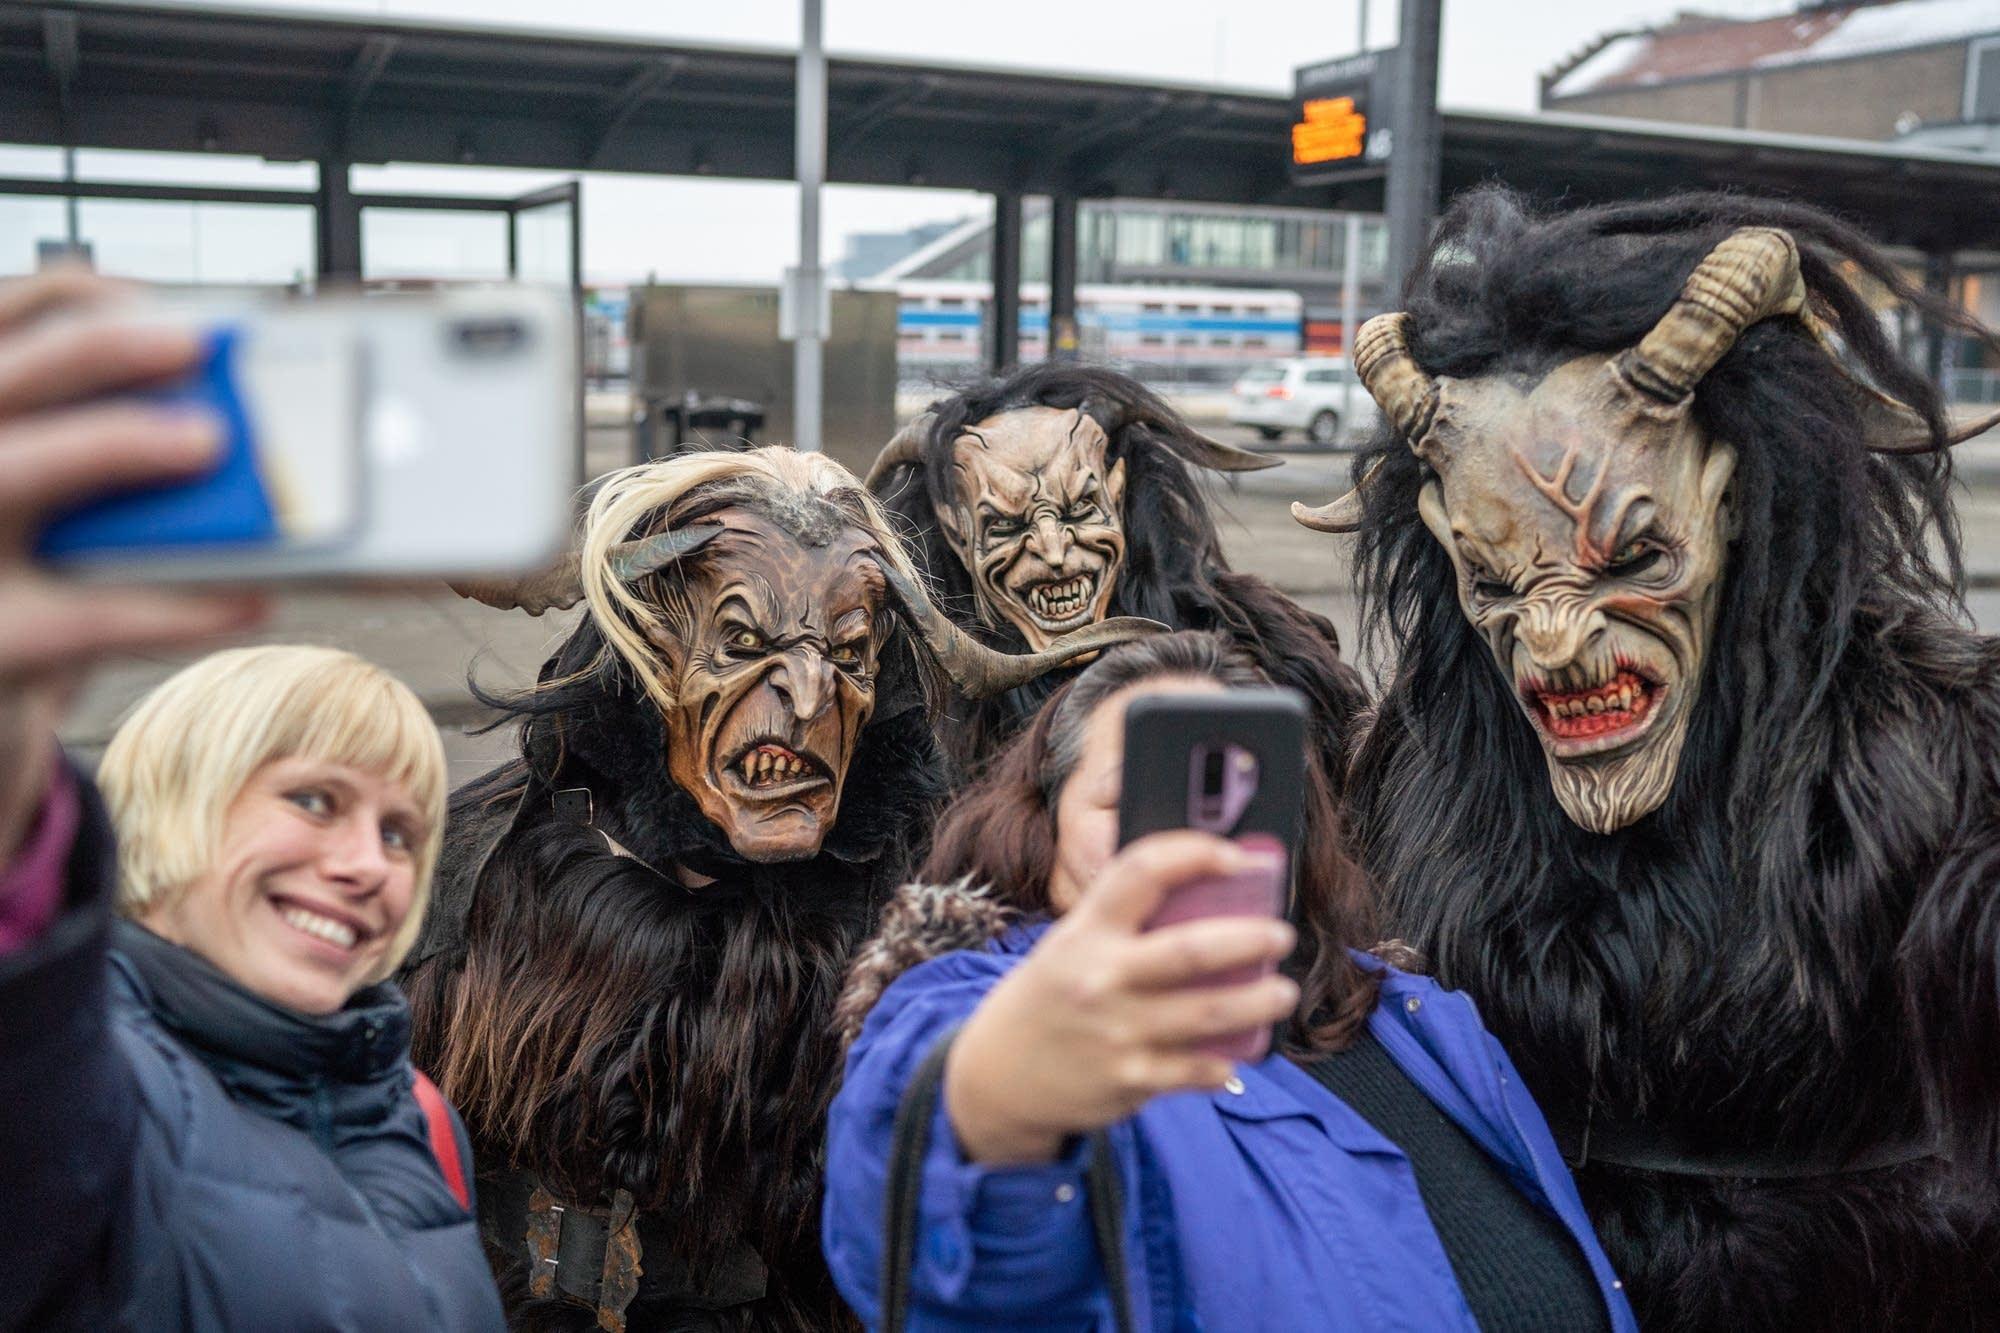 Sasha Denisova and Sheri Arisumi take selfies with three Krampus.